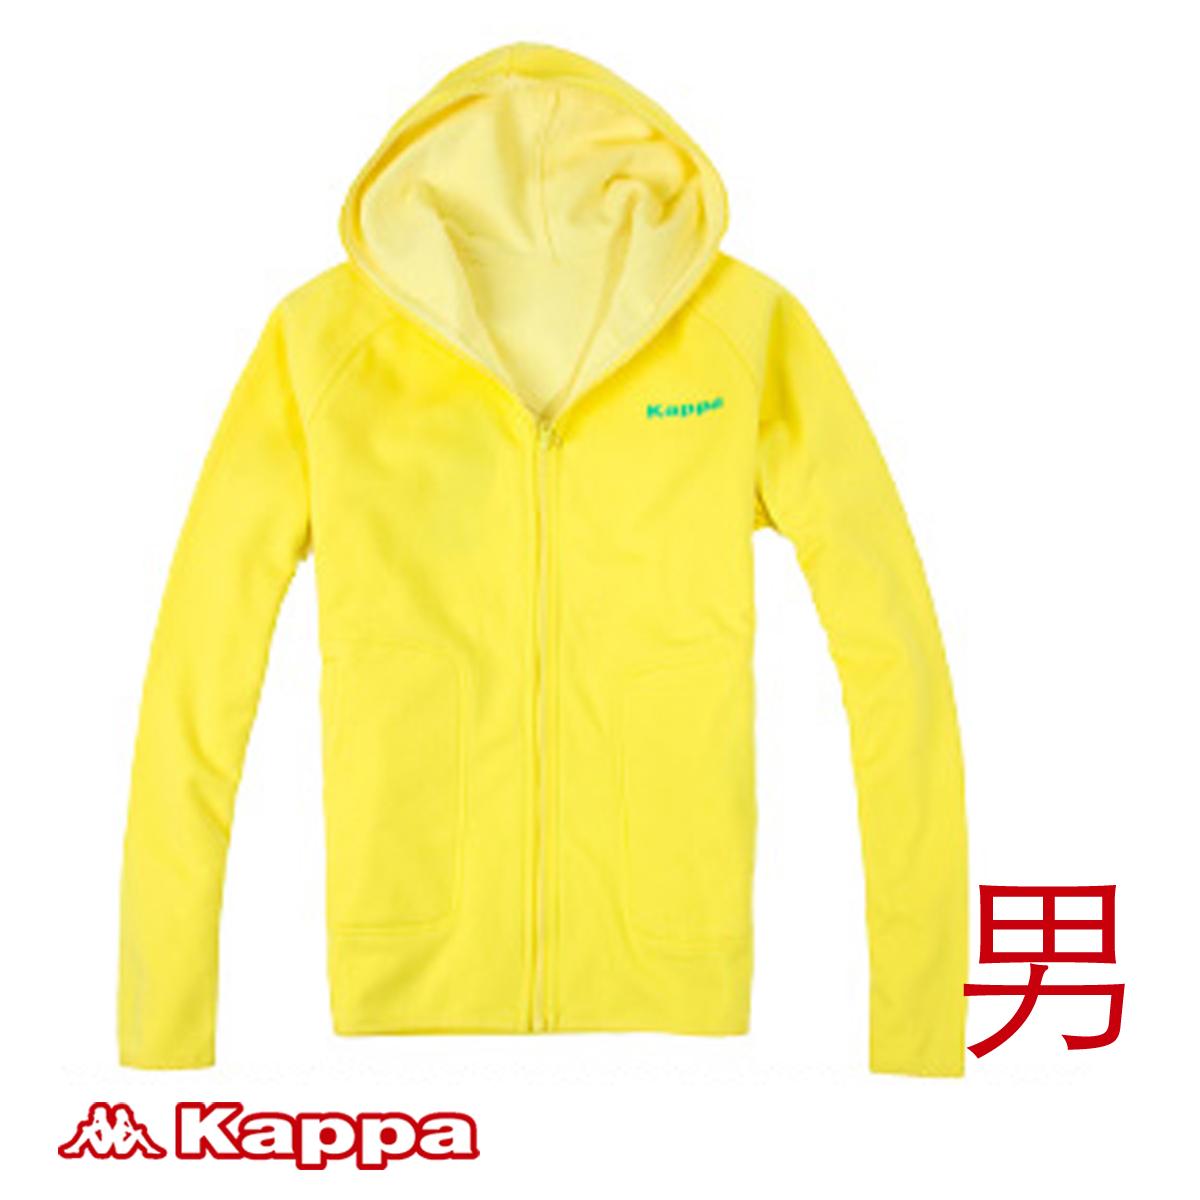 Цвет: Желтый -223 - мужчины